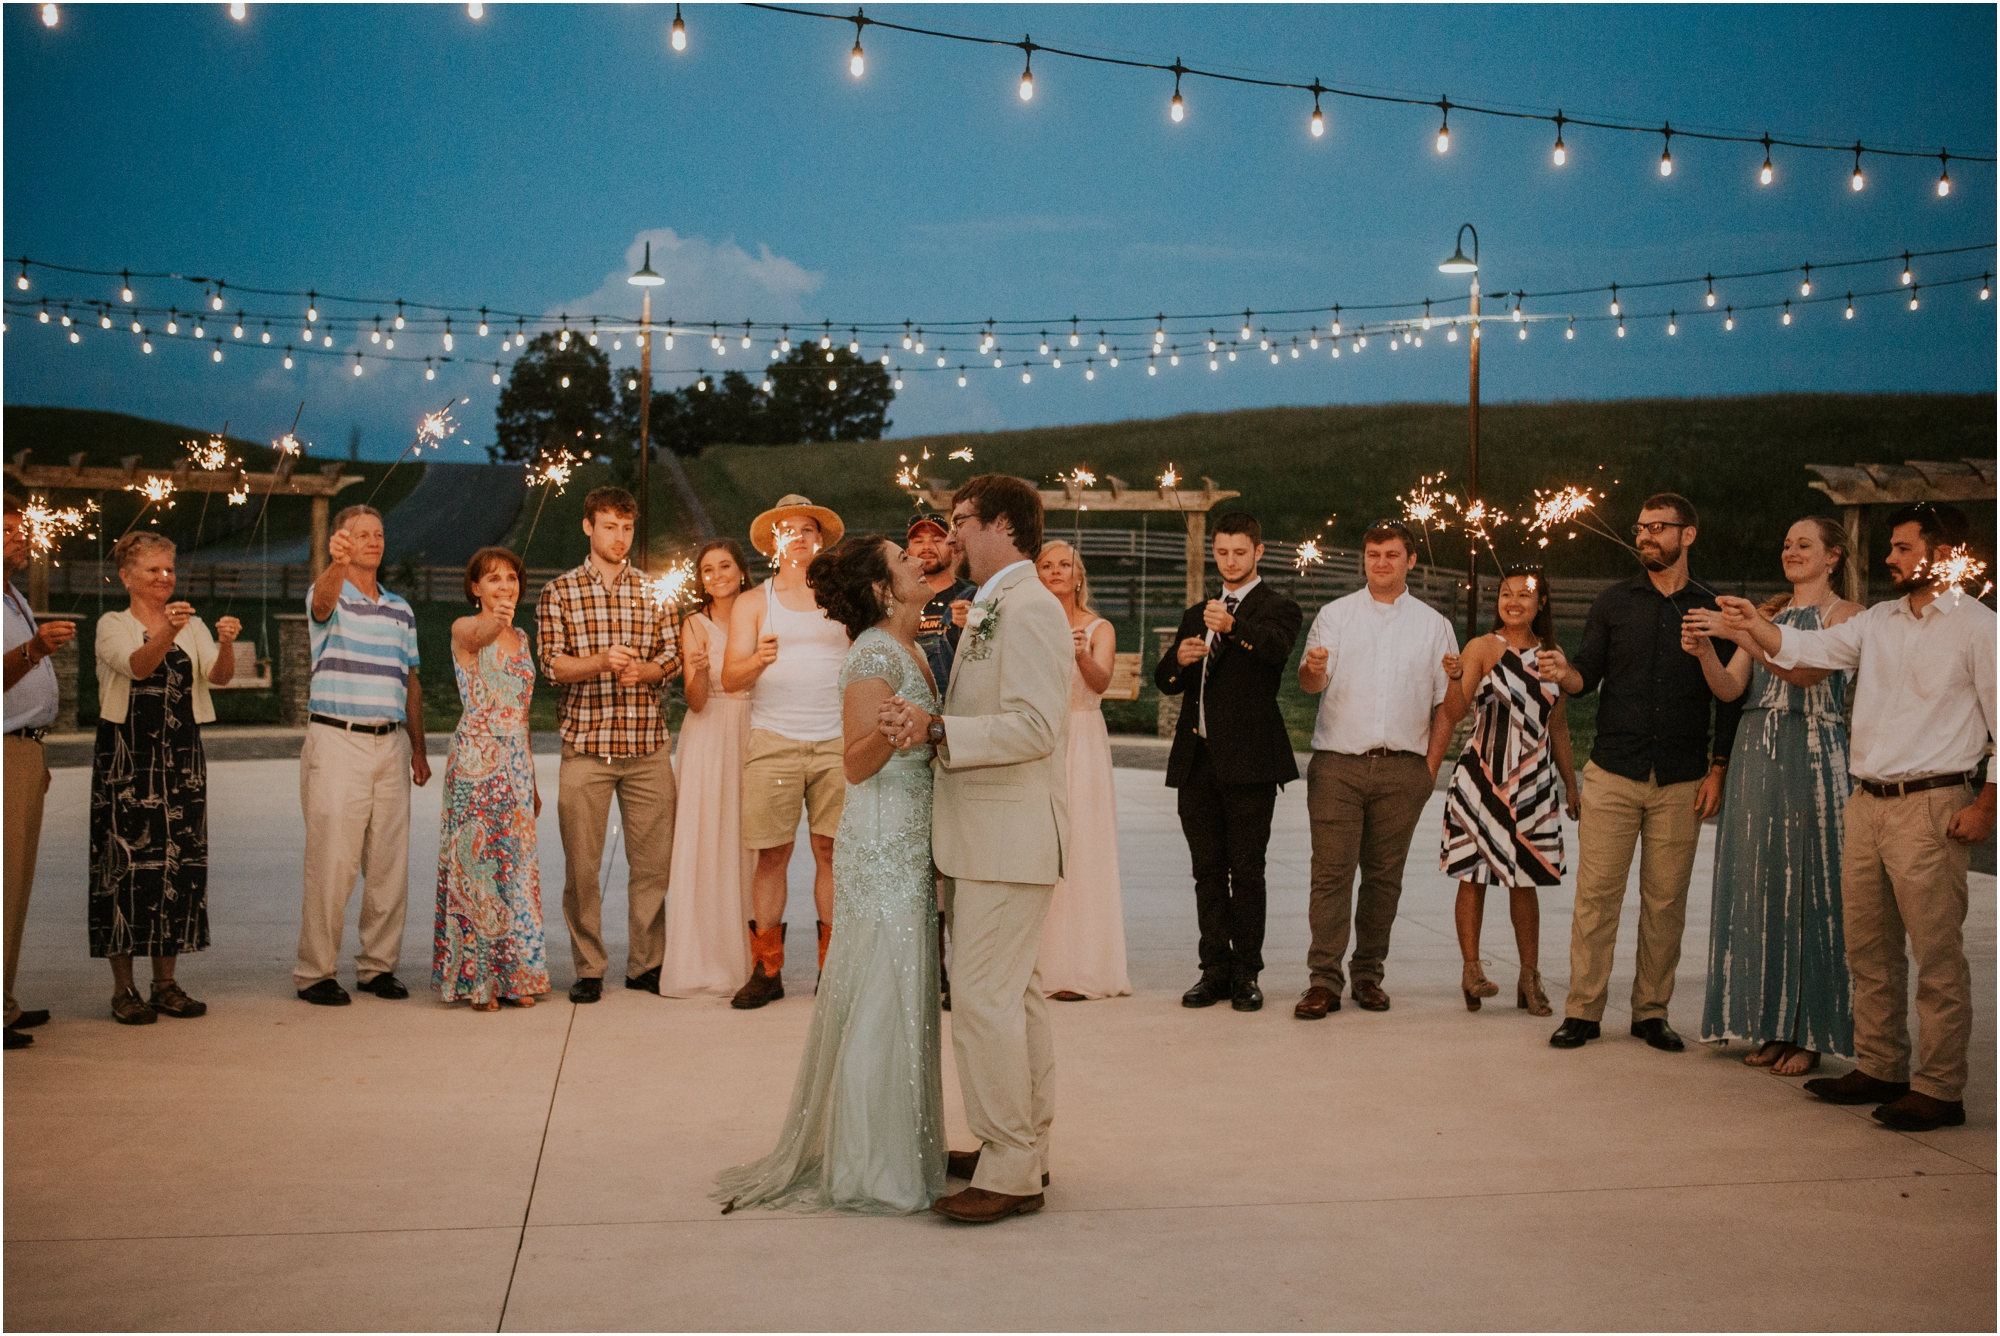 pink-rustic-apple-barn-howe-farms-elegant-summer-wedding-cleveland-tennessee-chattanooga-georgetown-tn_0177.jpg